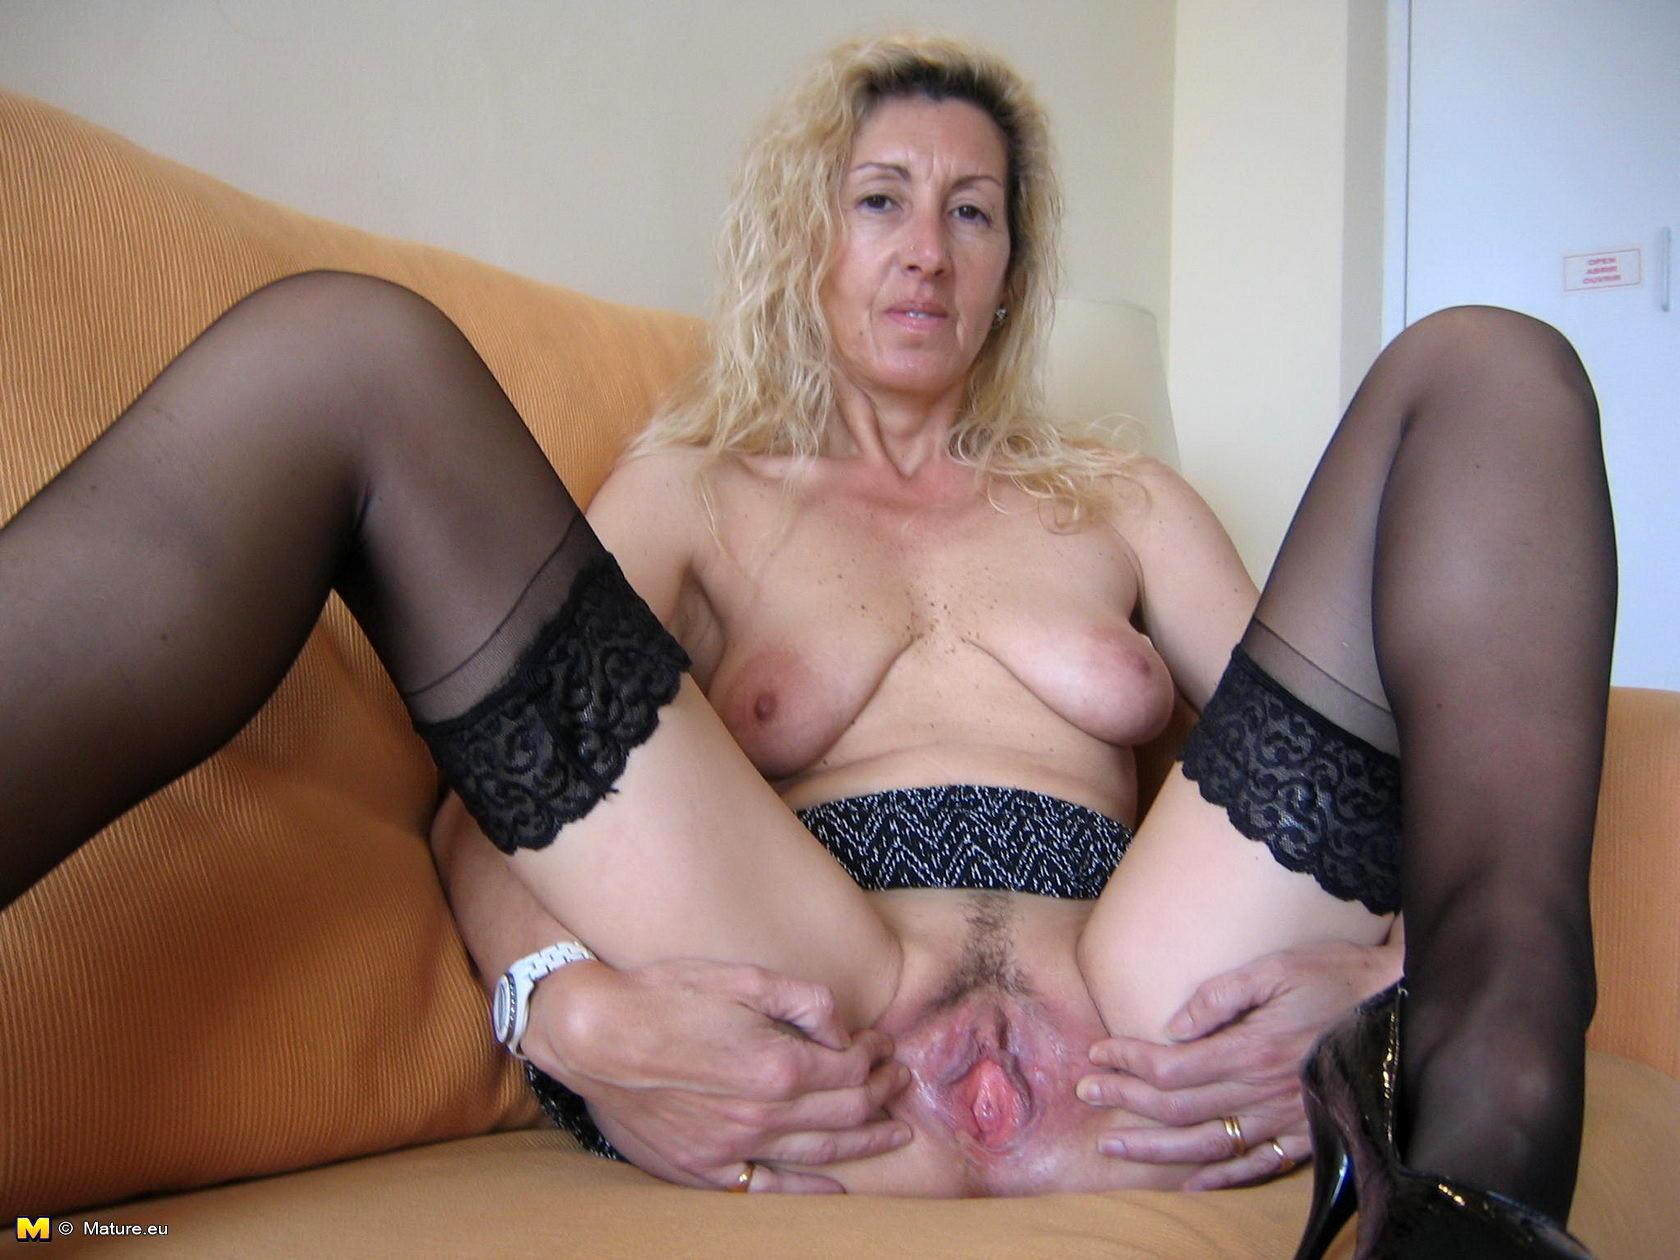 maturenl nice SexHD Pics